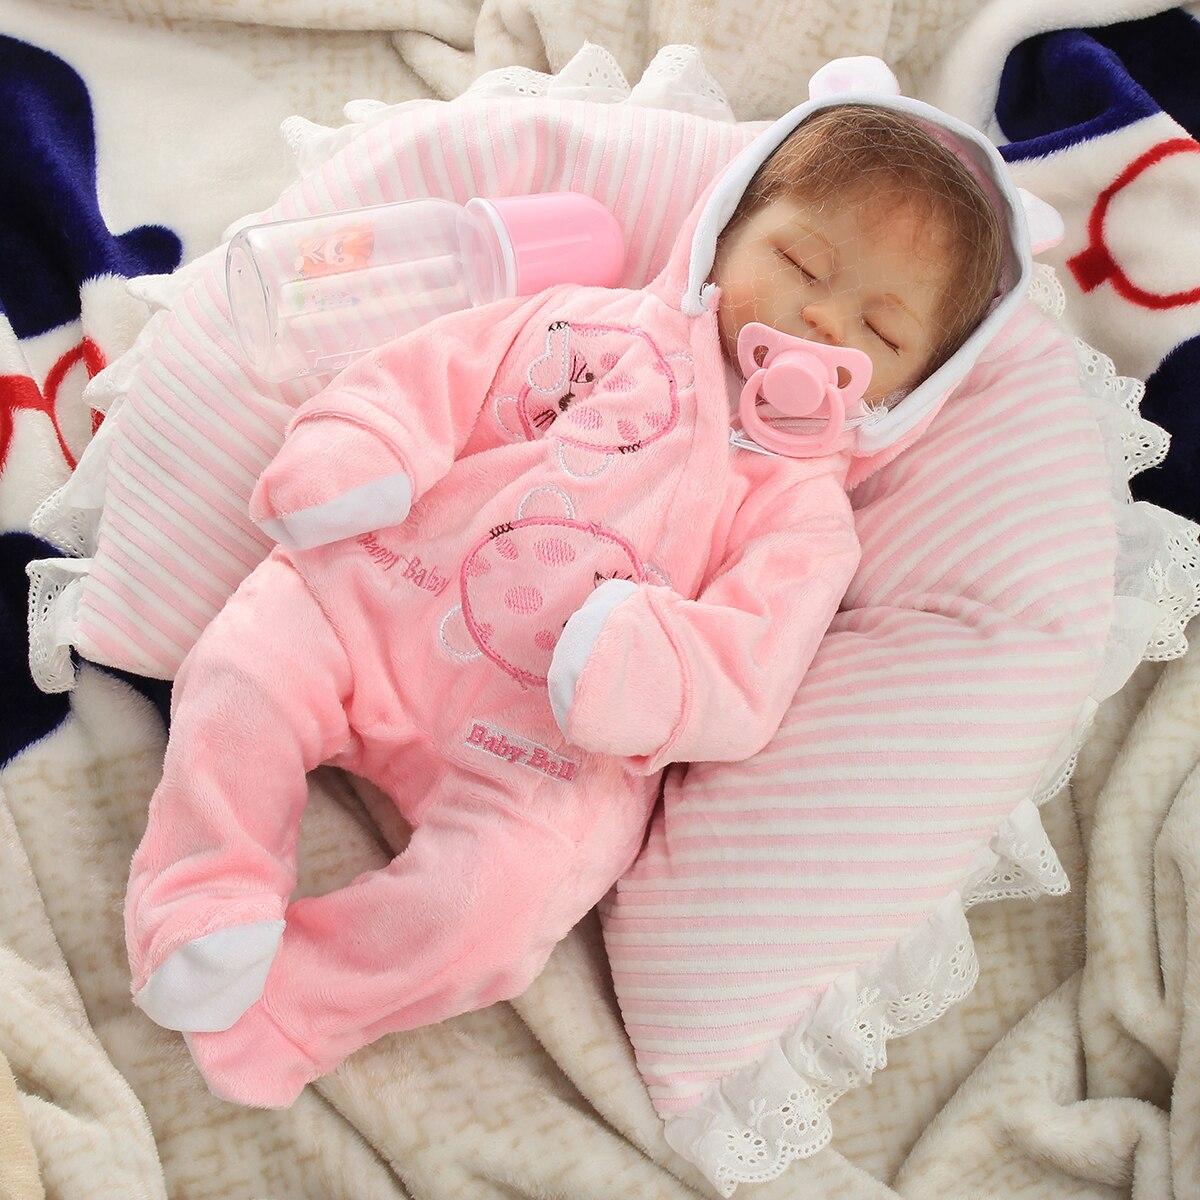 16/'/' Realistic Lifelike Reborn Baby Doll+Clothes Sleeping Newborn Girl Gift